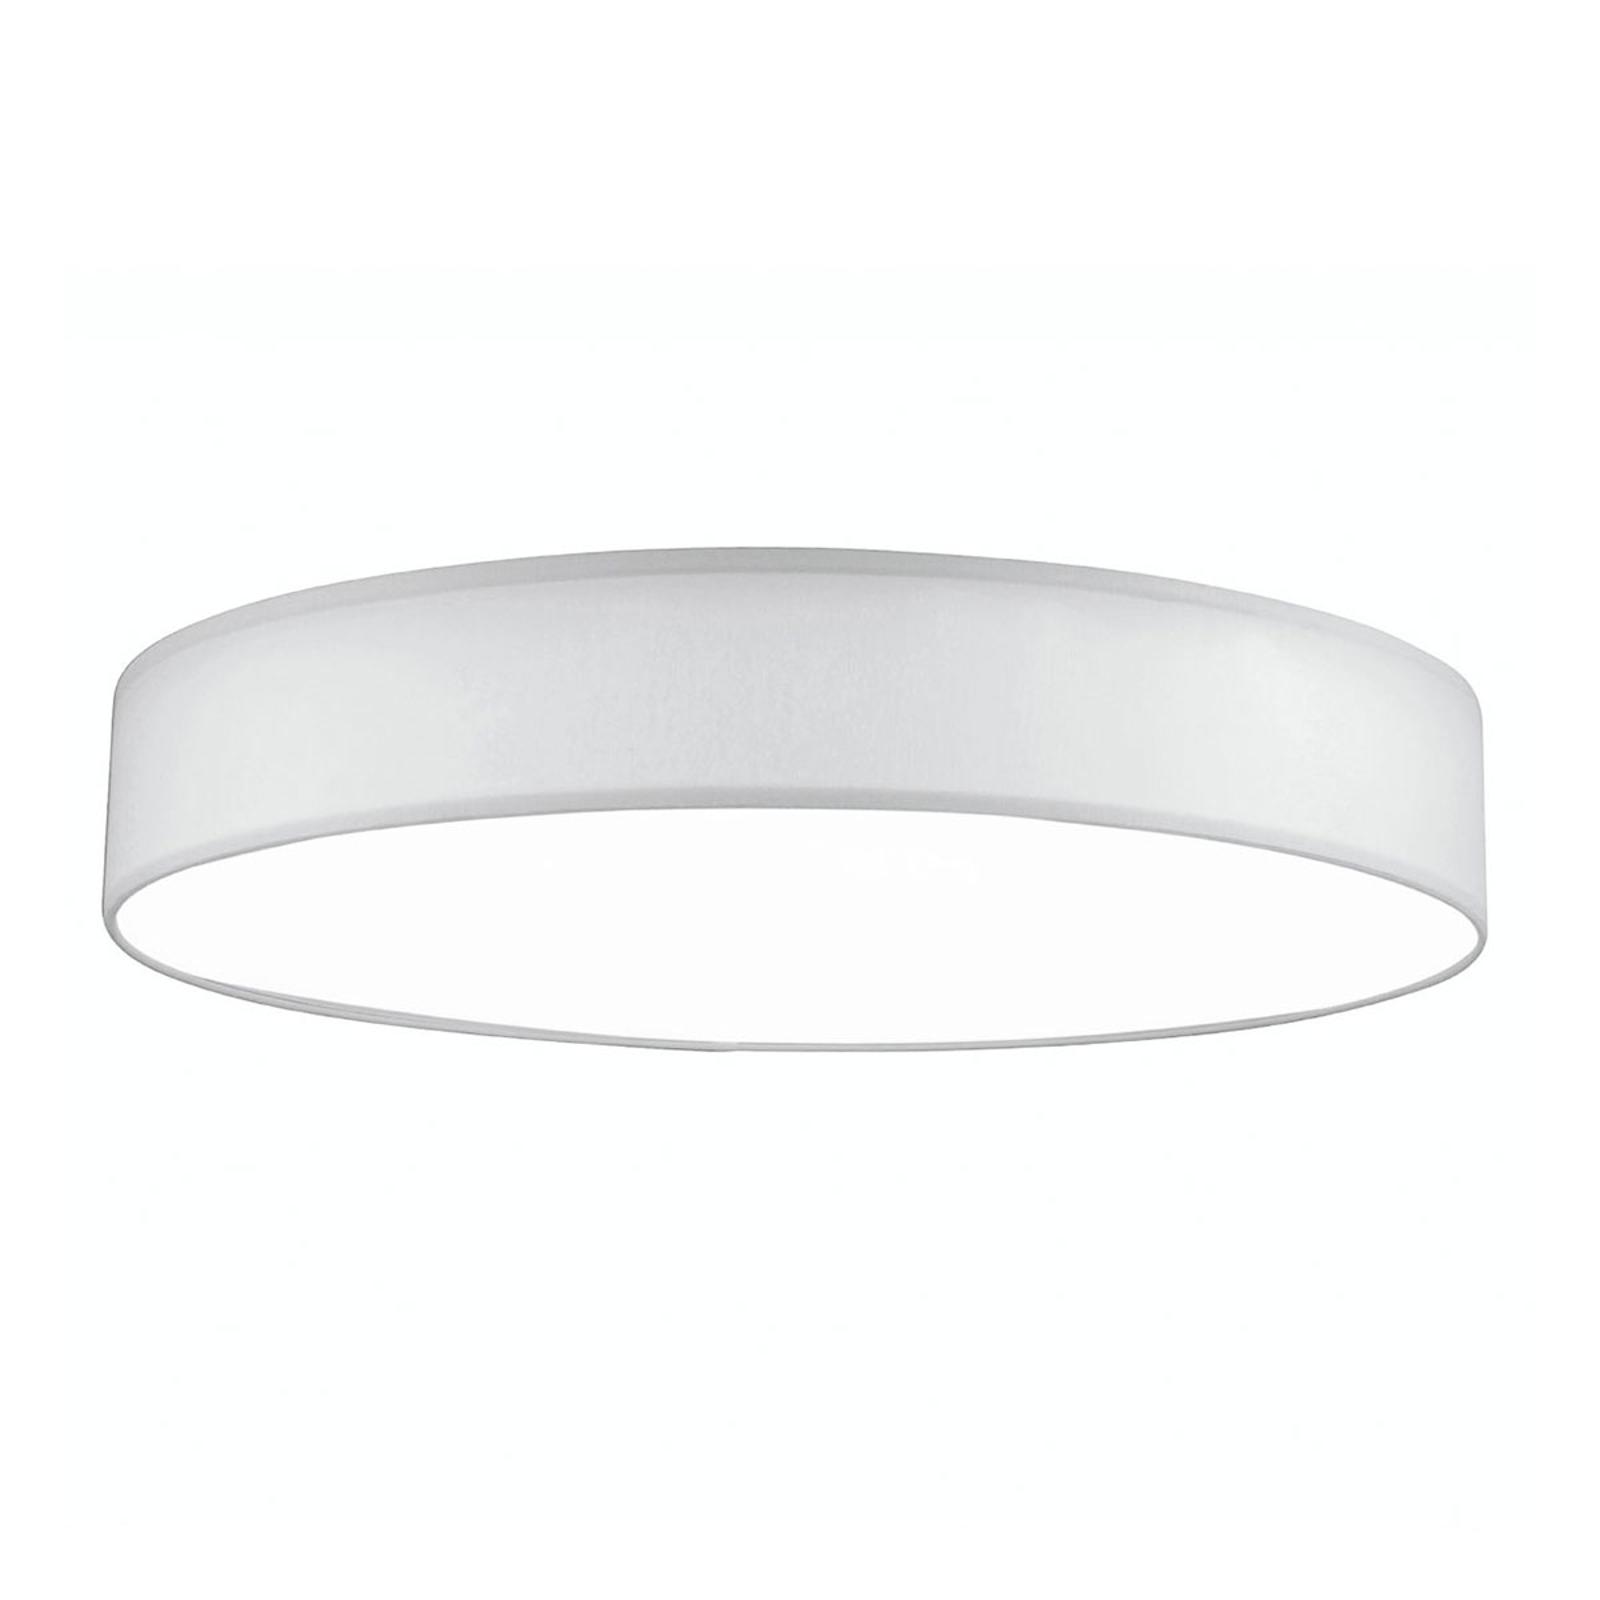 Lampa sufitowa LED Luno XL 3000K 60 W biała